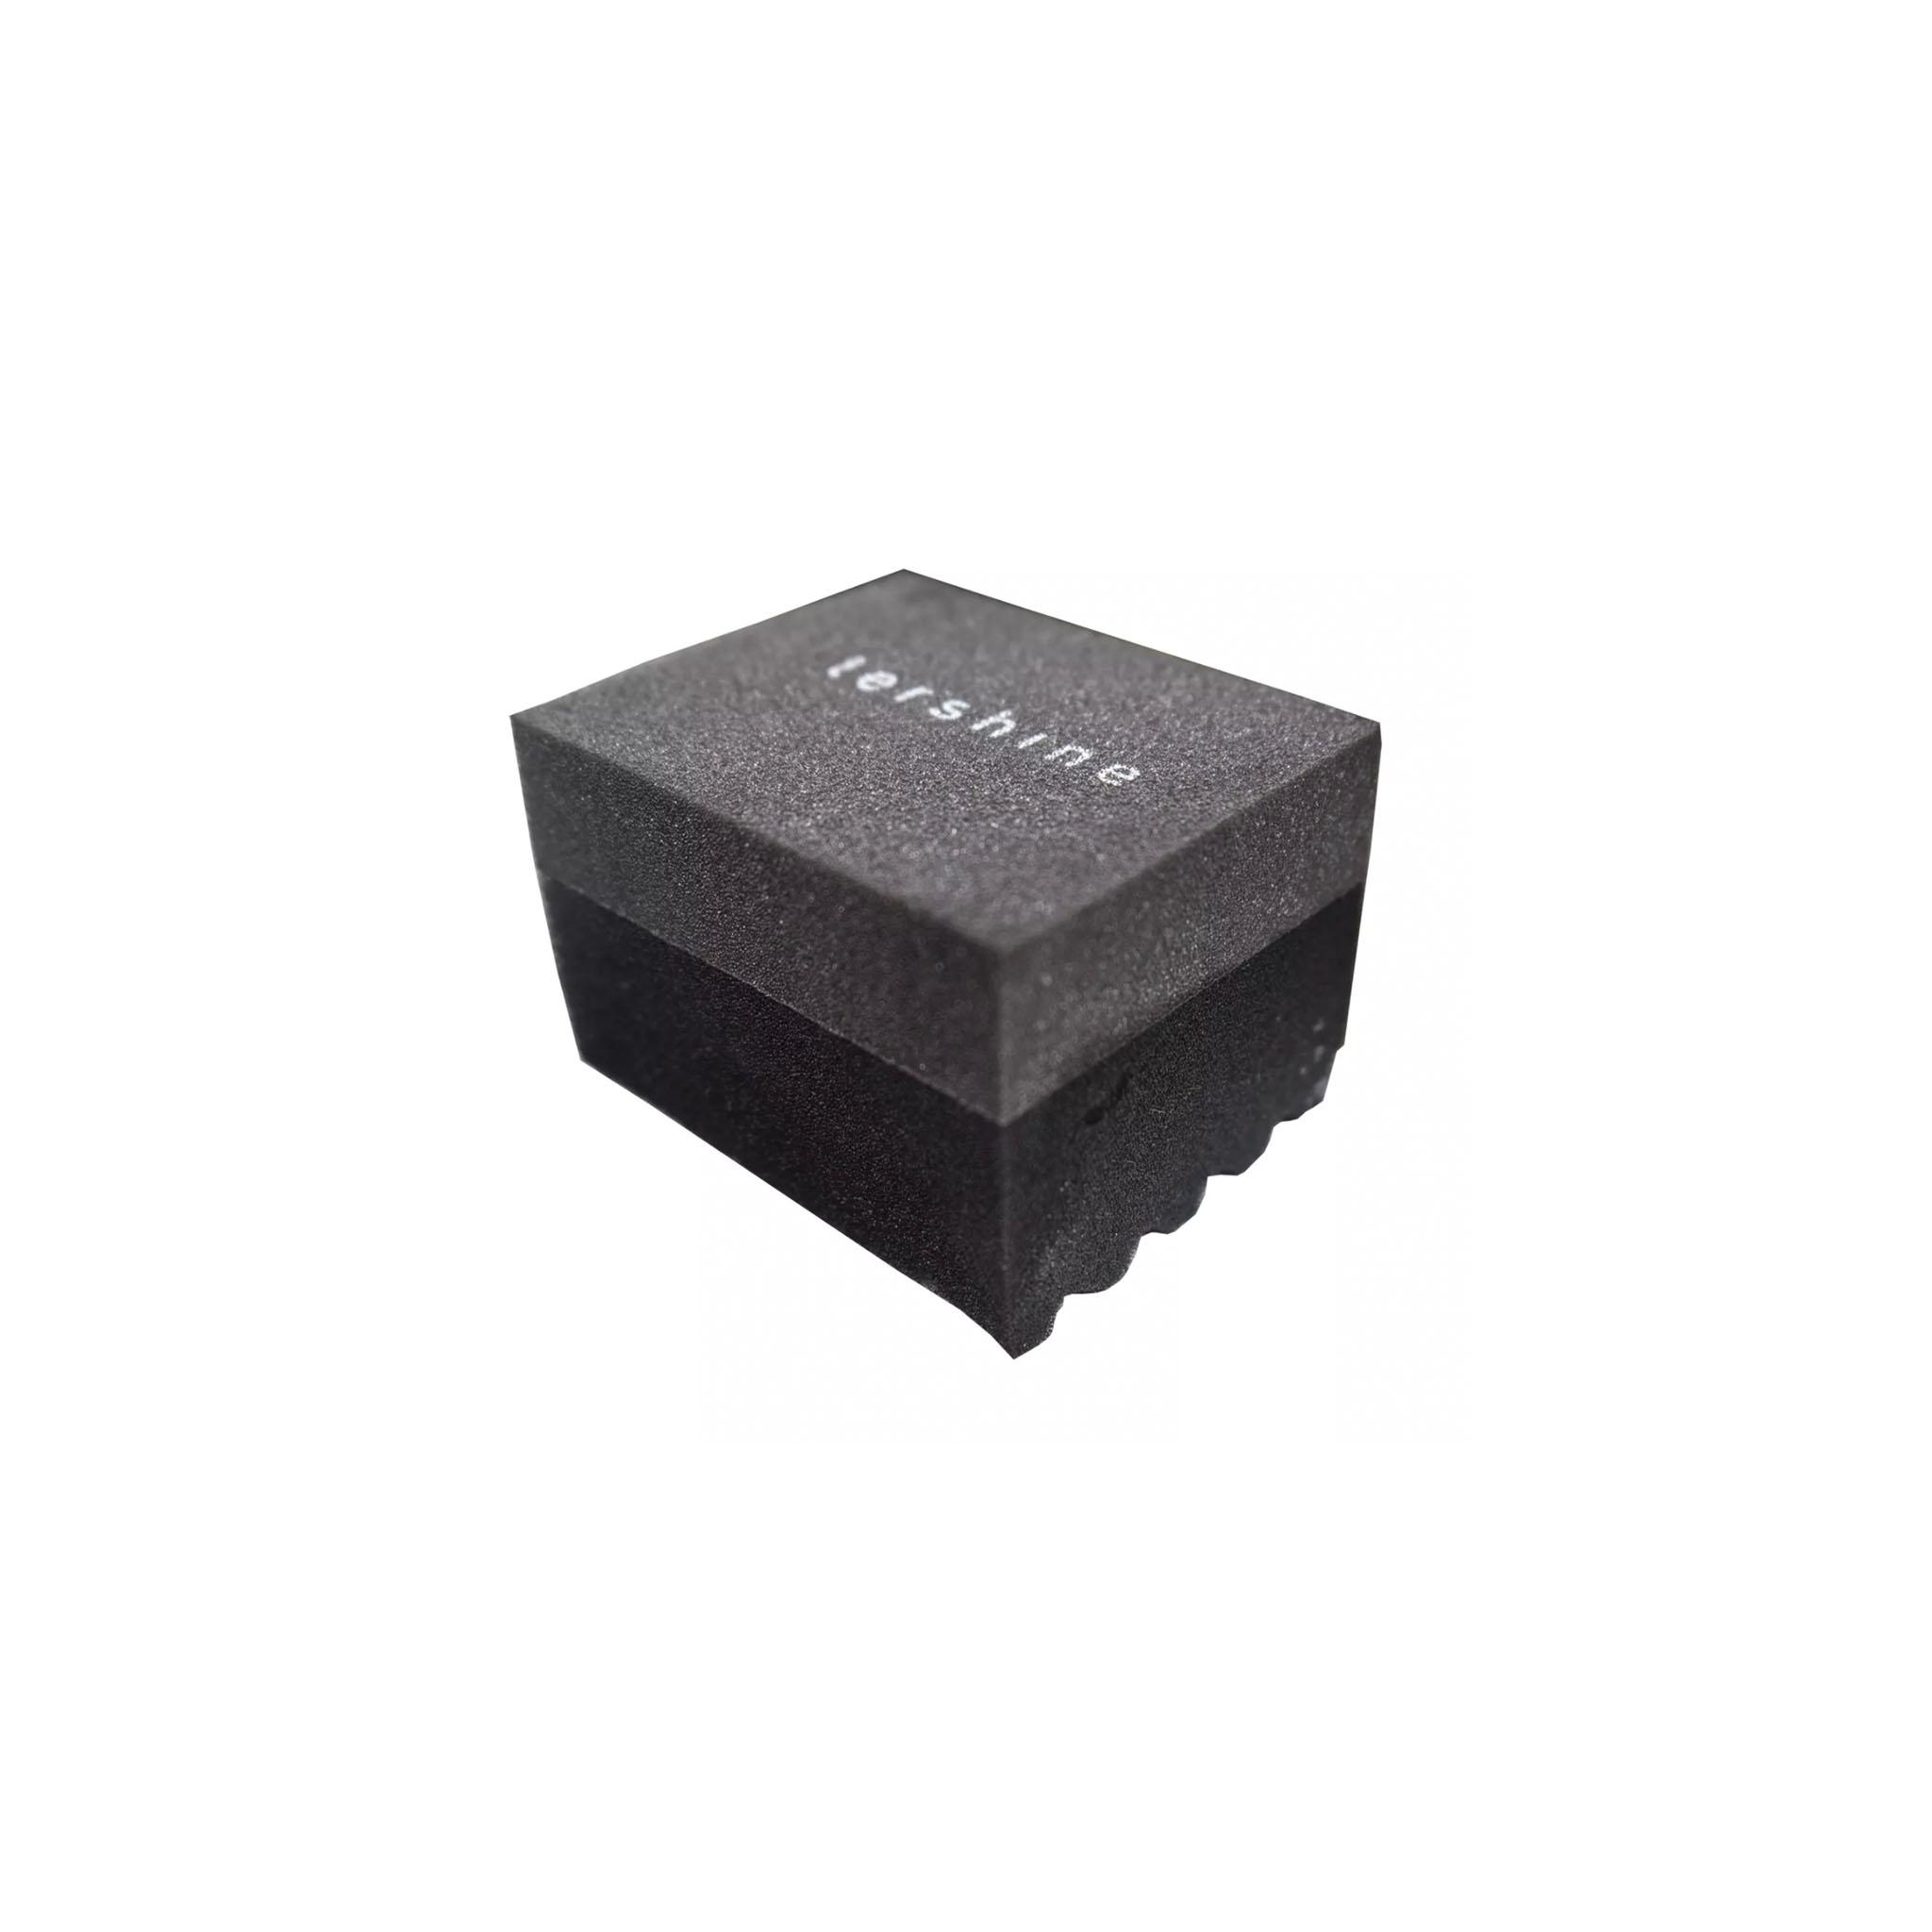 Appliceringssvamp tershine Applicator, 9x8x7 cm